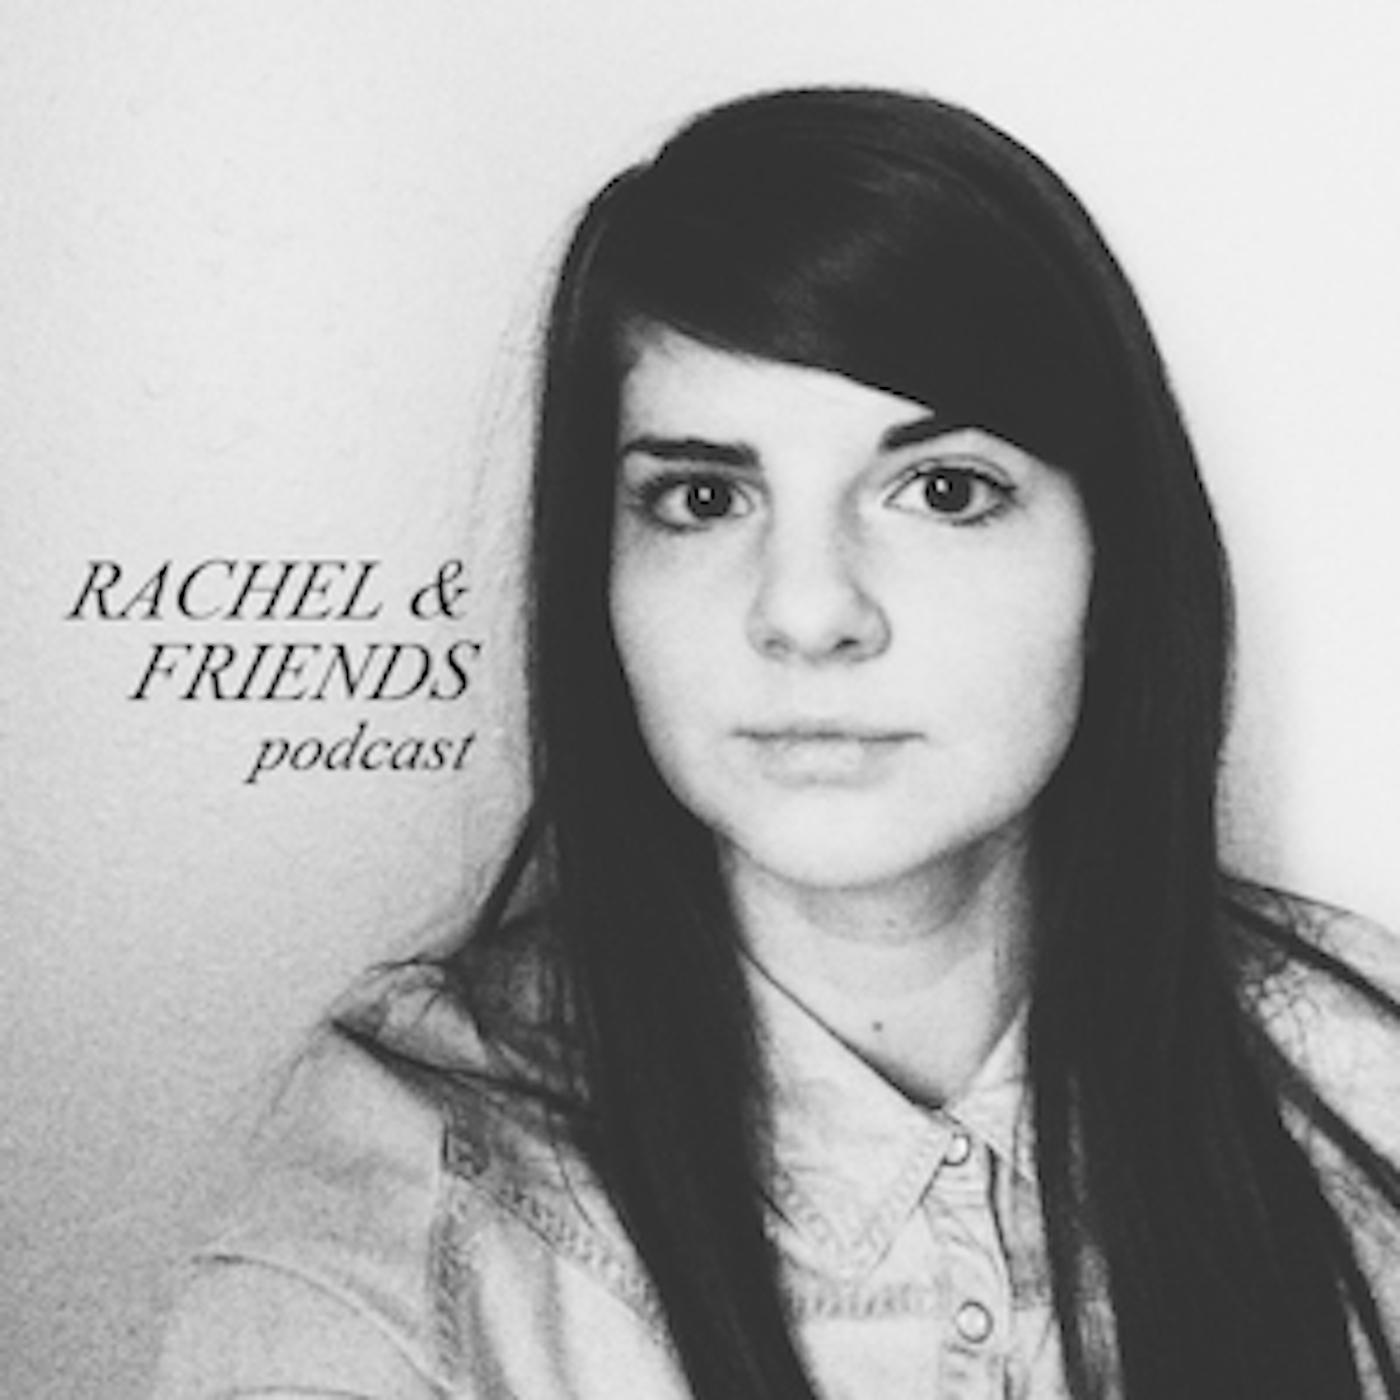 Rachel & Friends